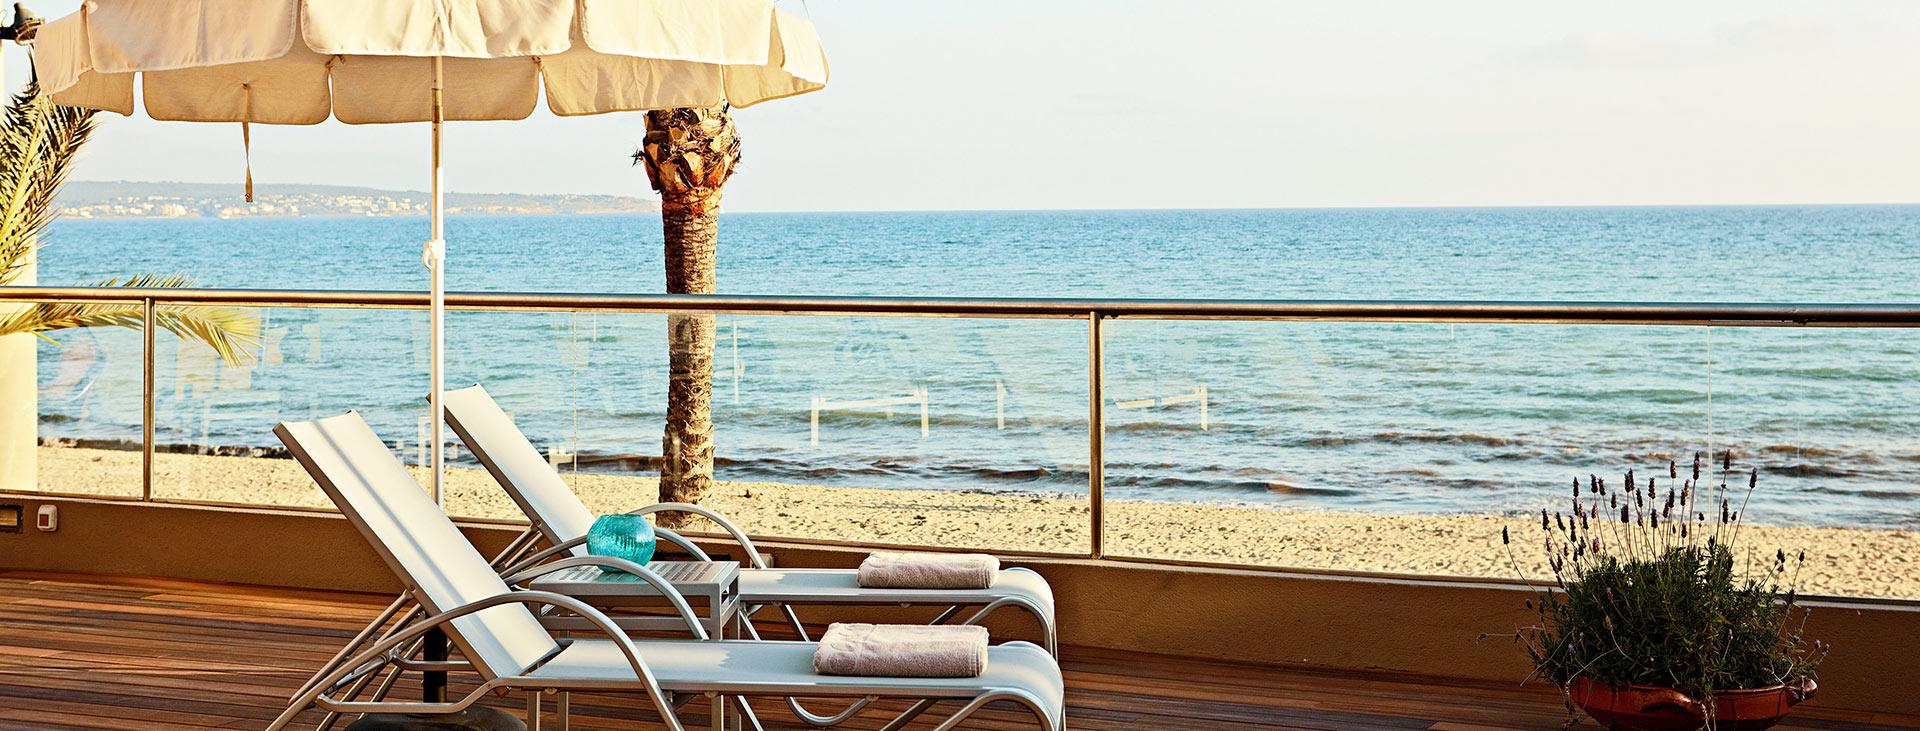 Sunprime Palma Beach, Playa de Palma, Mallorca, Espanja